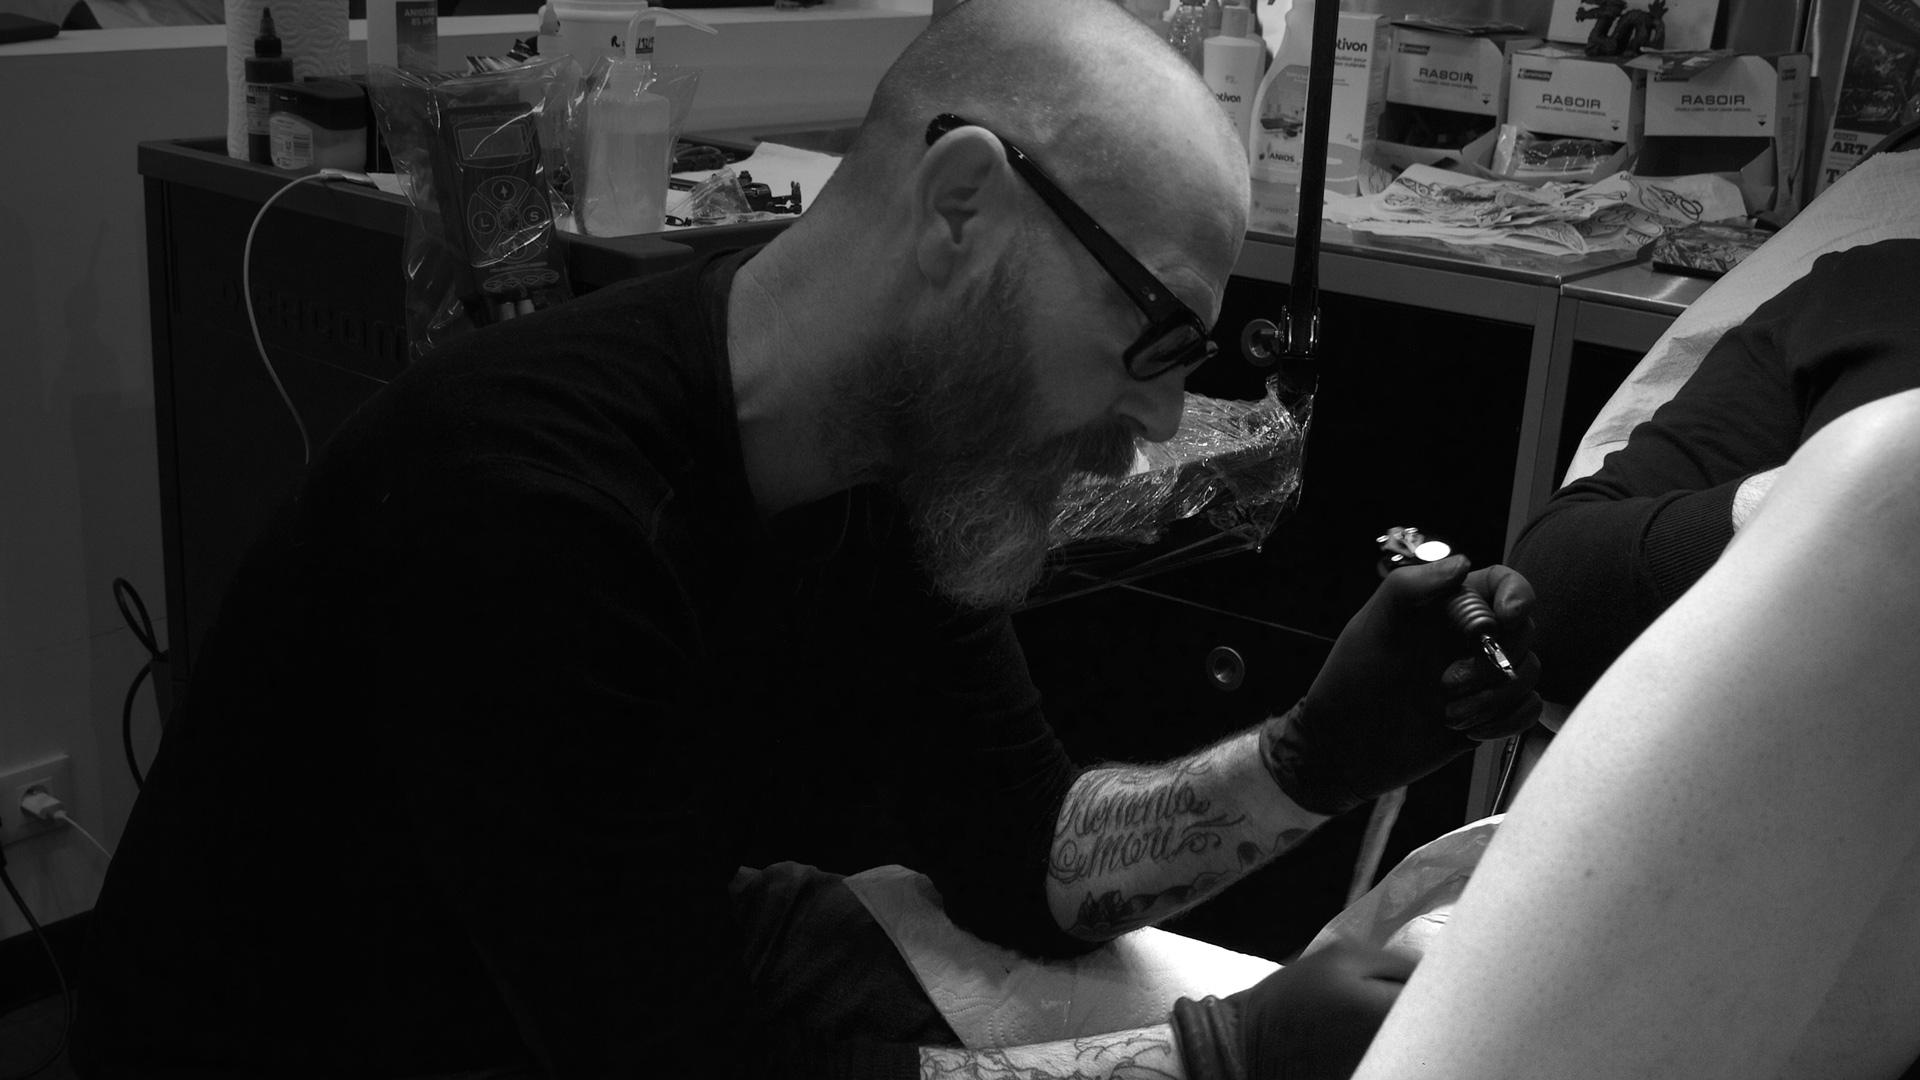 dolph tatoueur